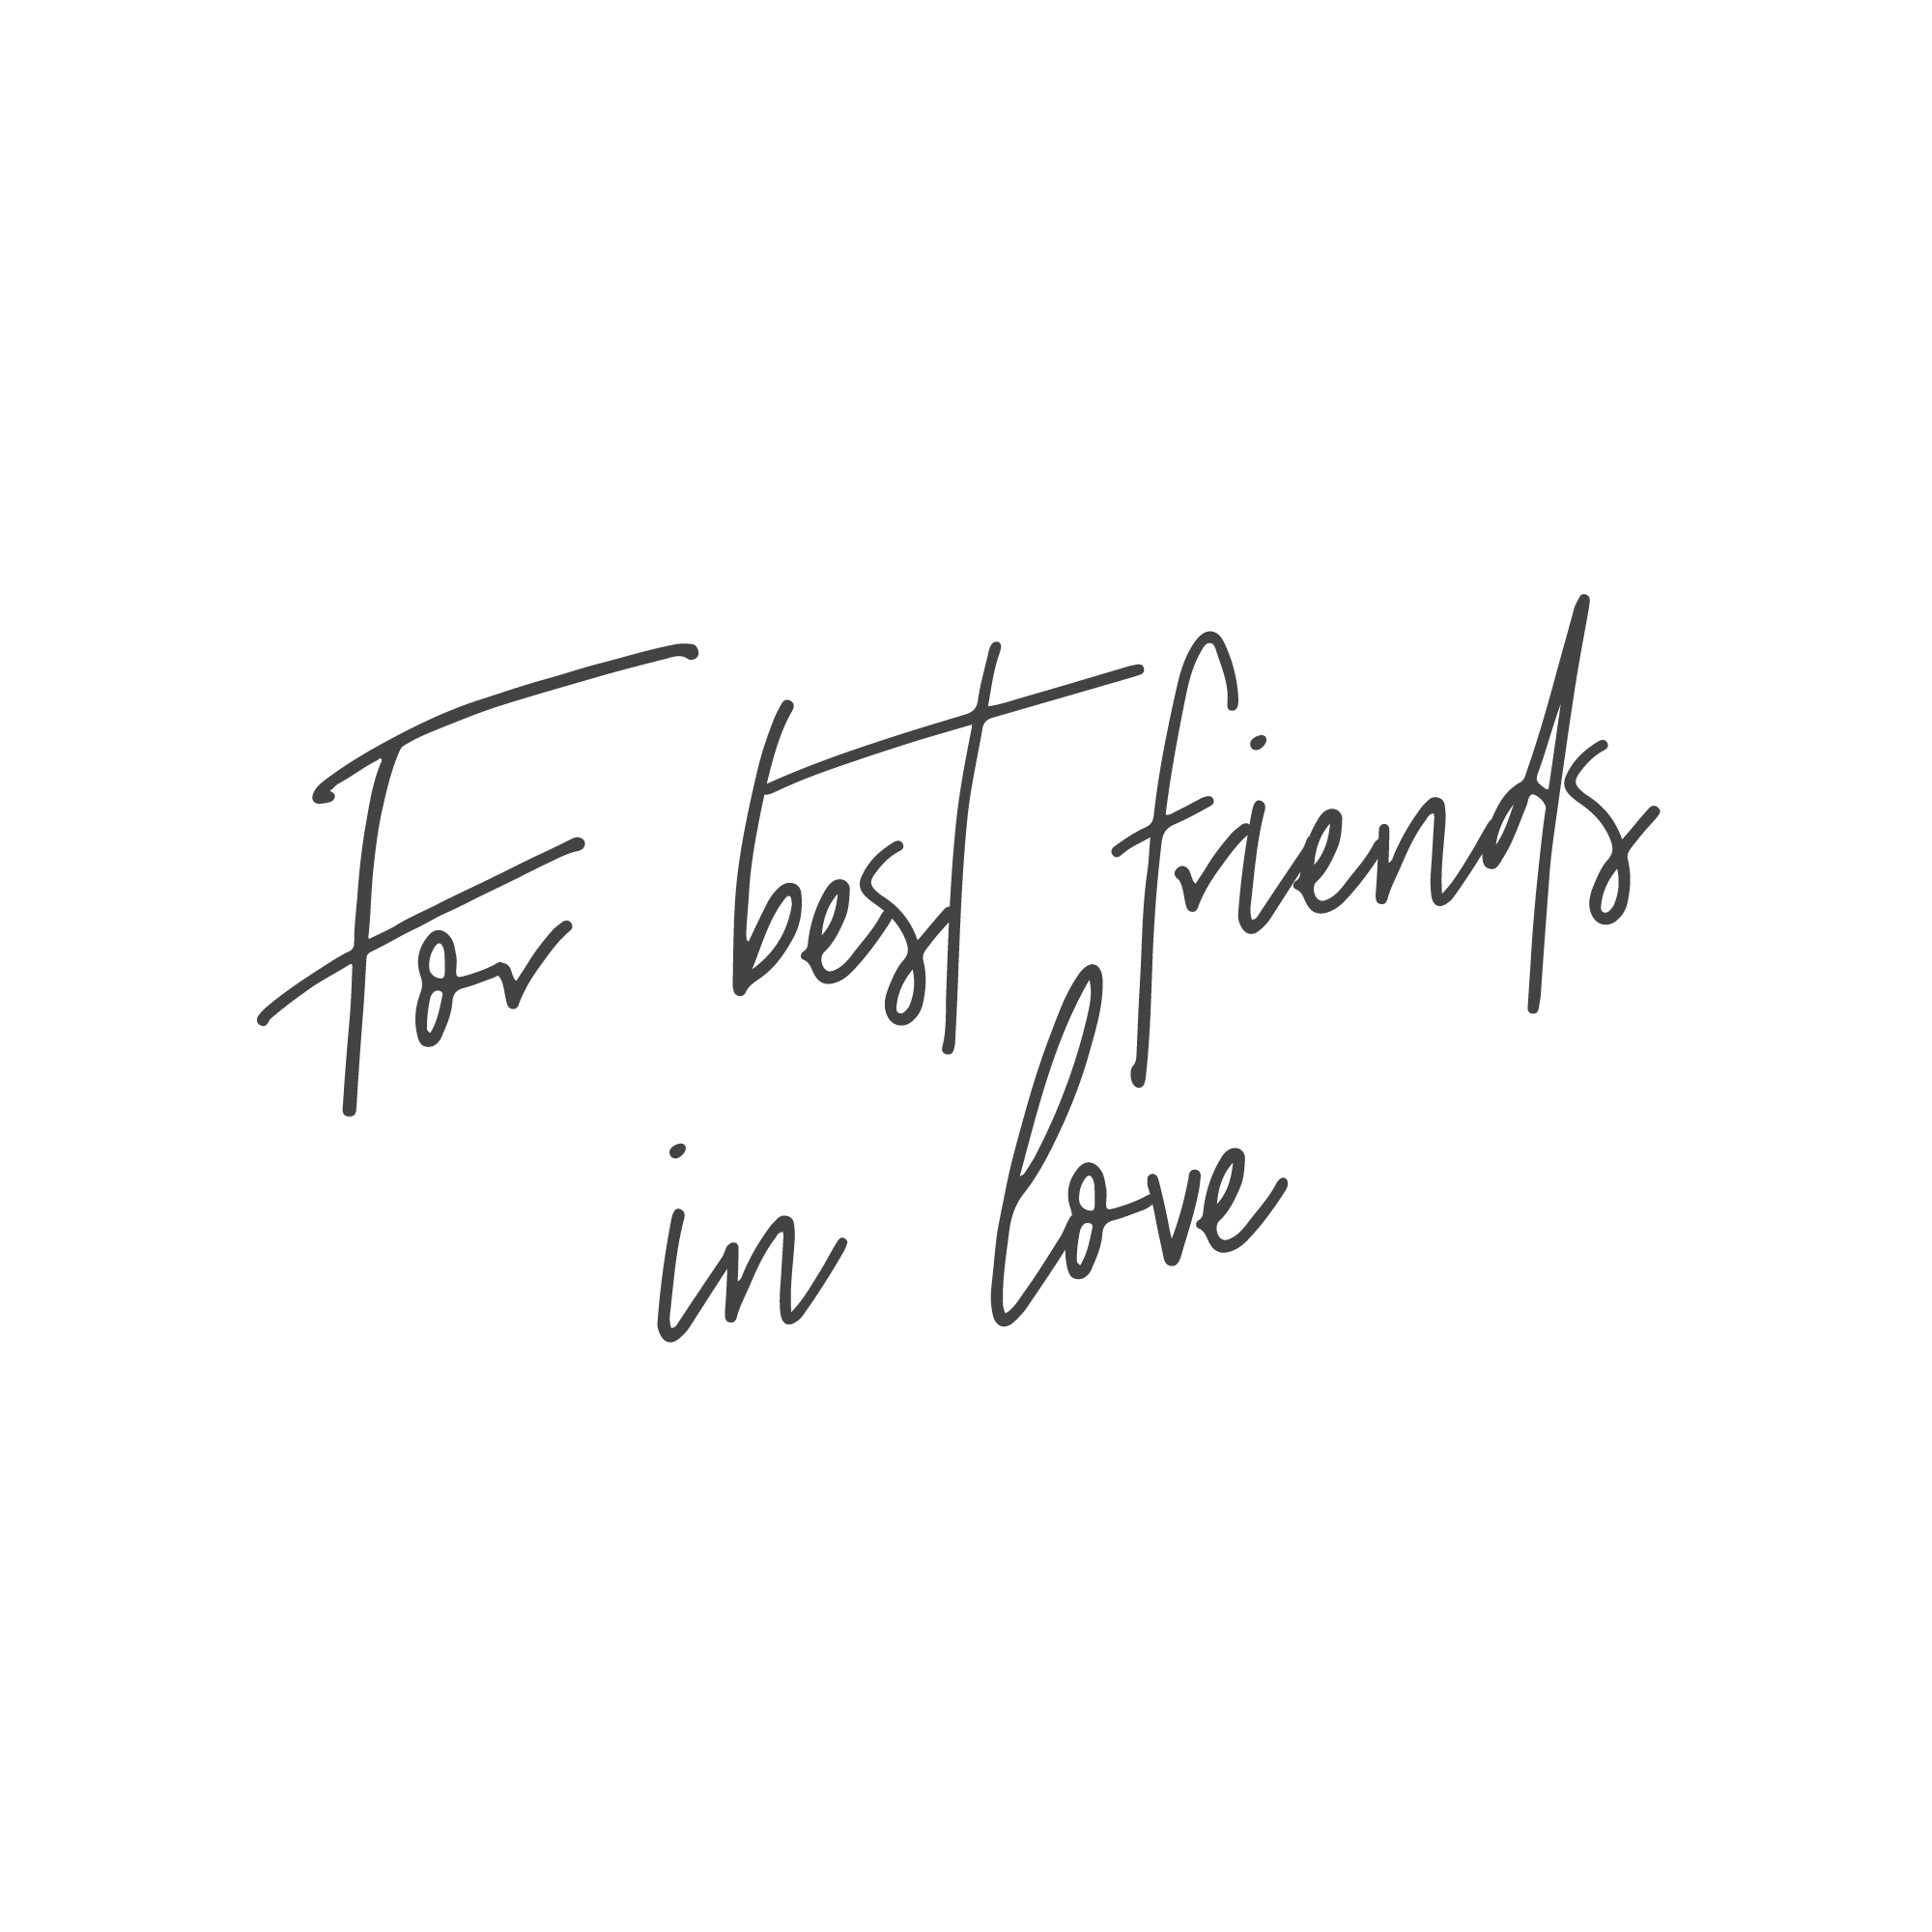 bestfriendsinlove.png